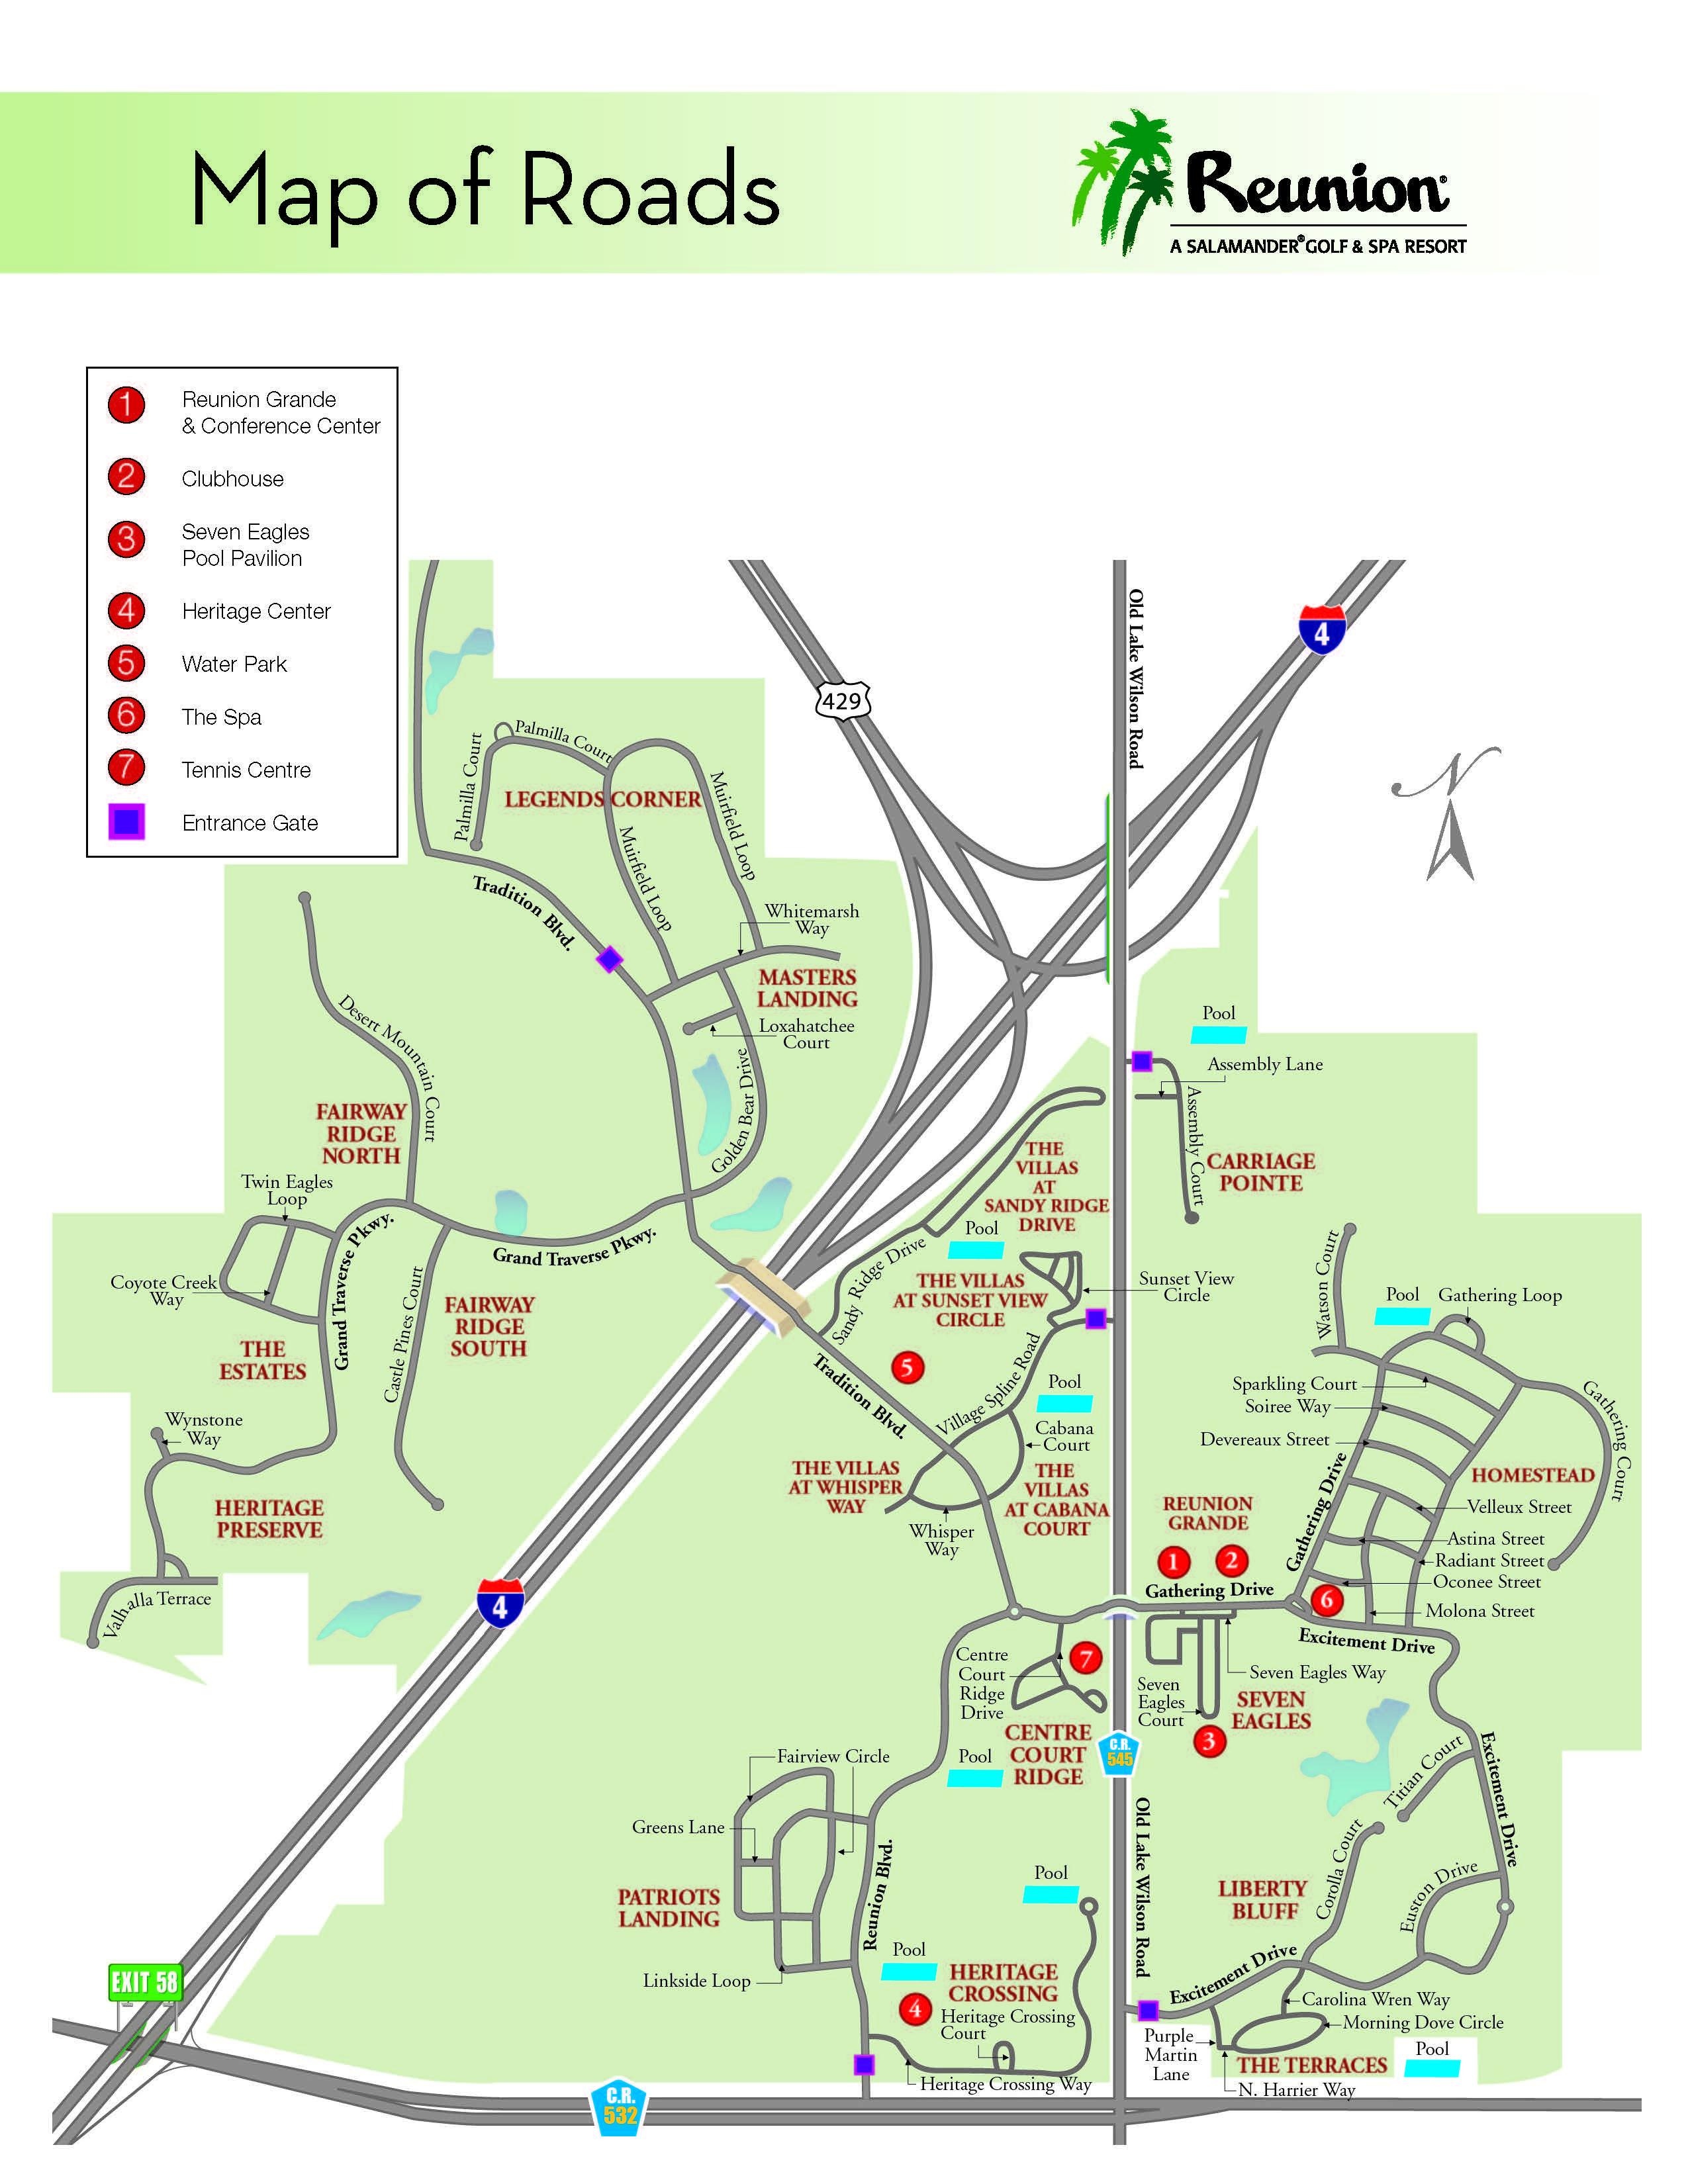 Orlando Vacation | Reunion Resort - Location & Directions |Family - Reunion Florida Map